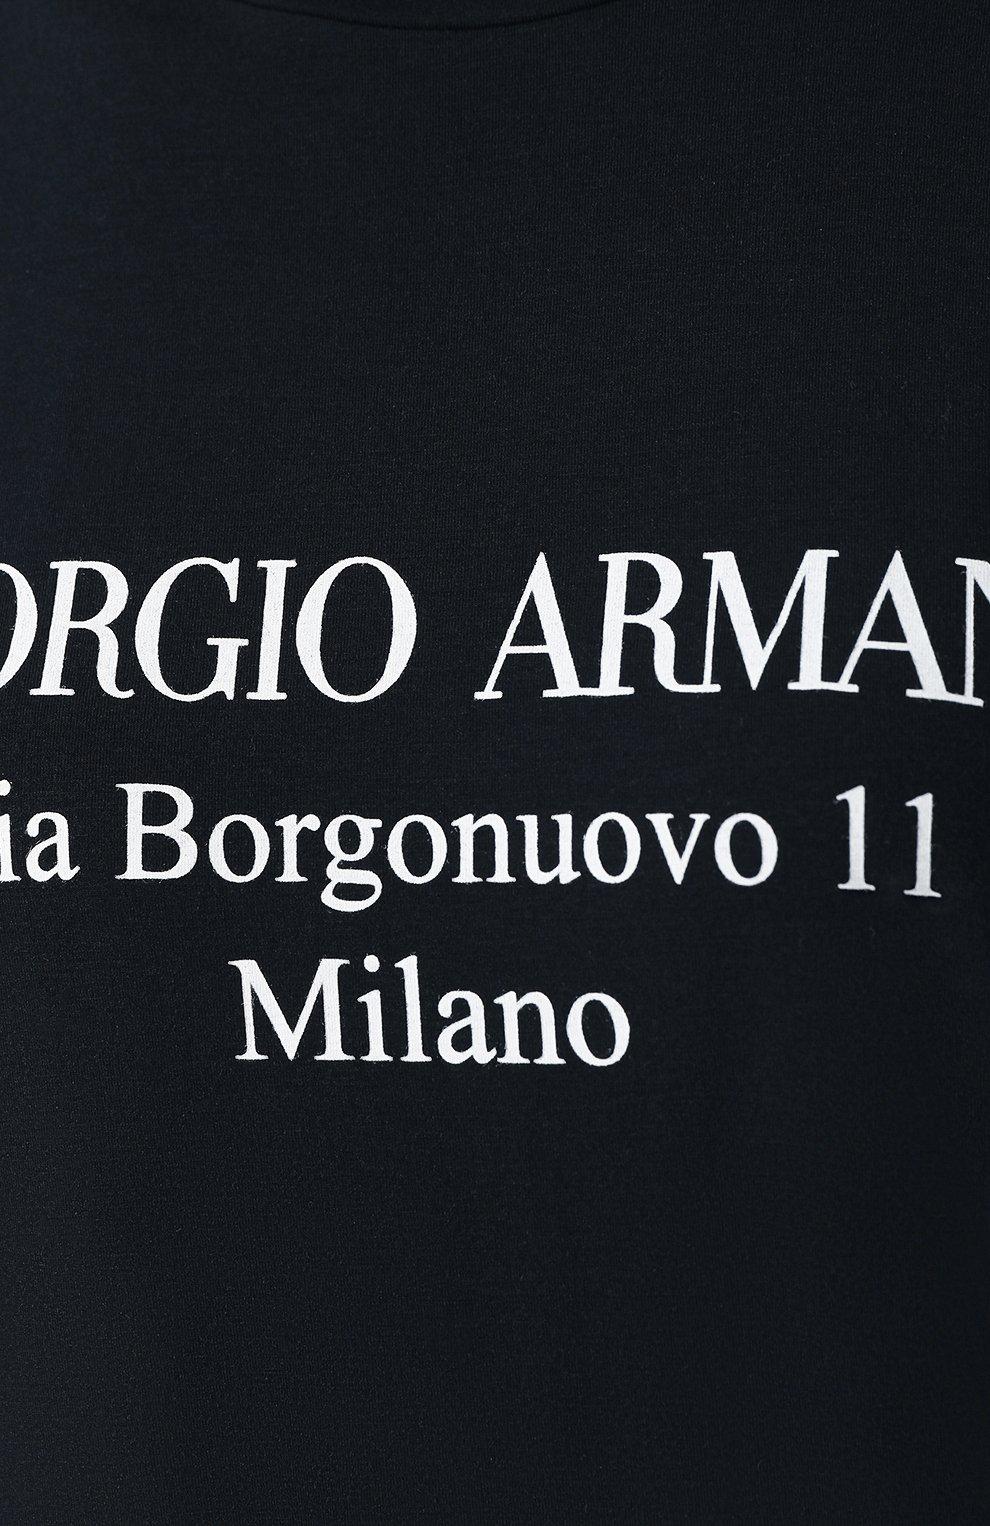 Футболка из вискозы Giorgio Armani черная | Фото №5